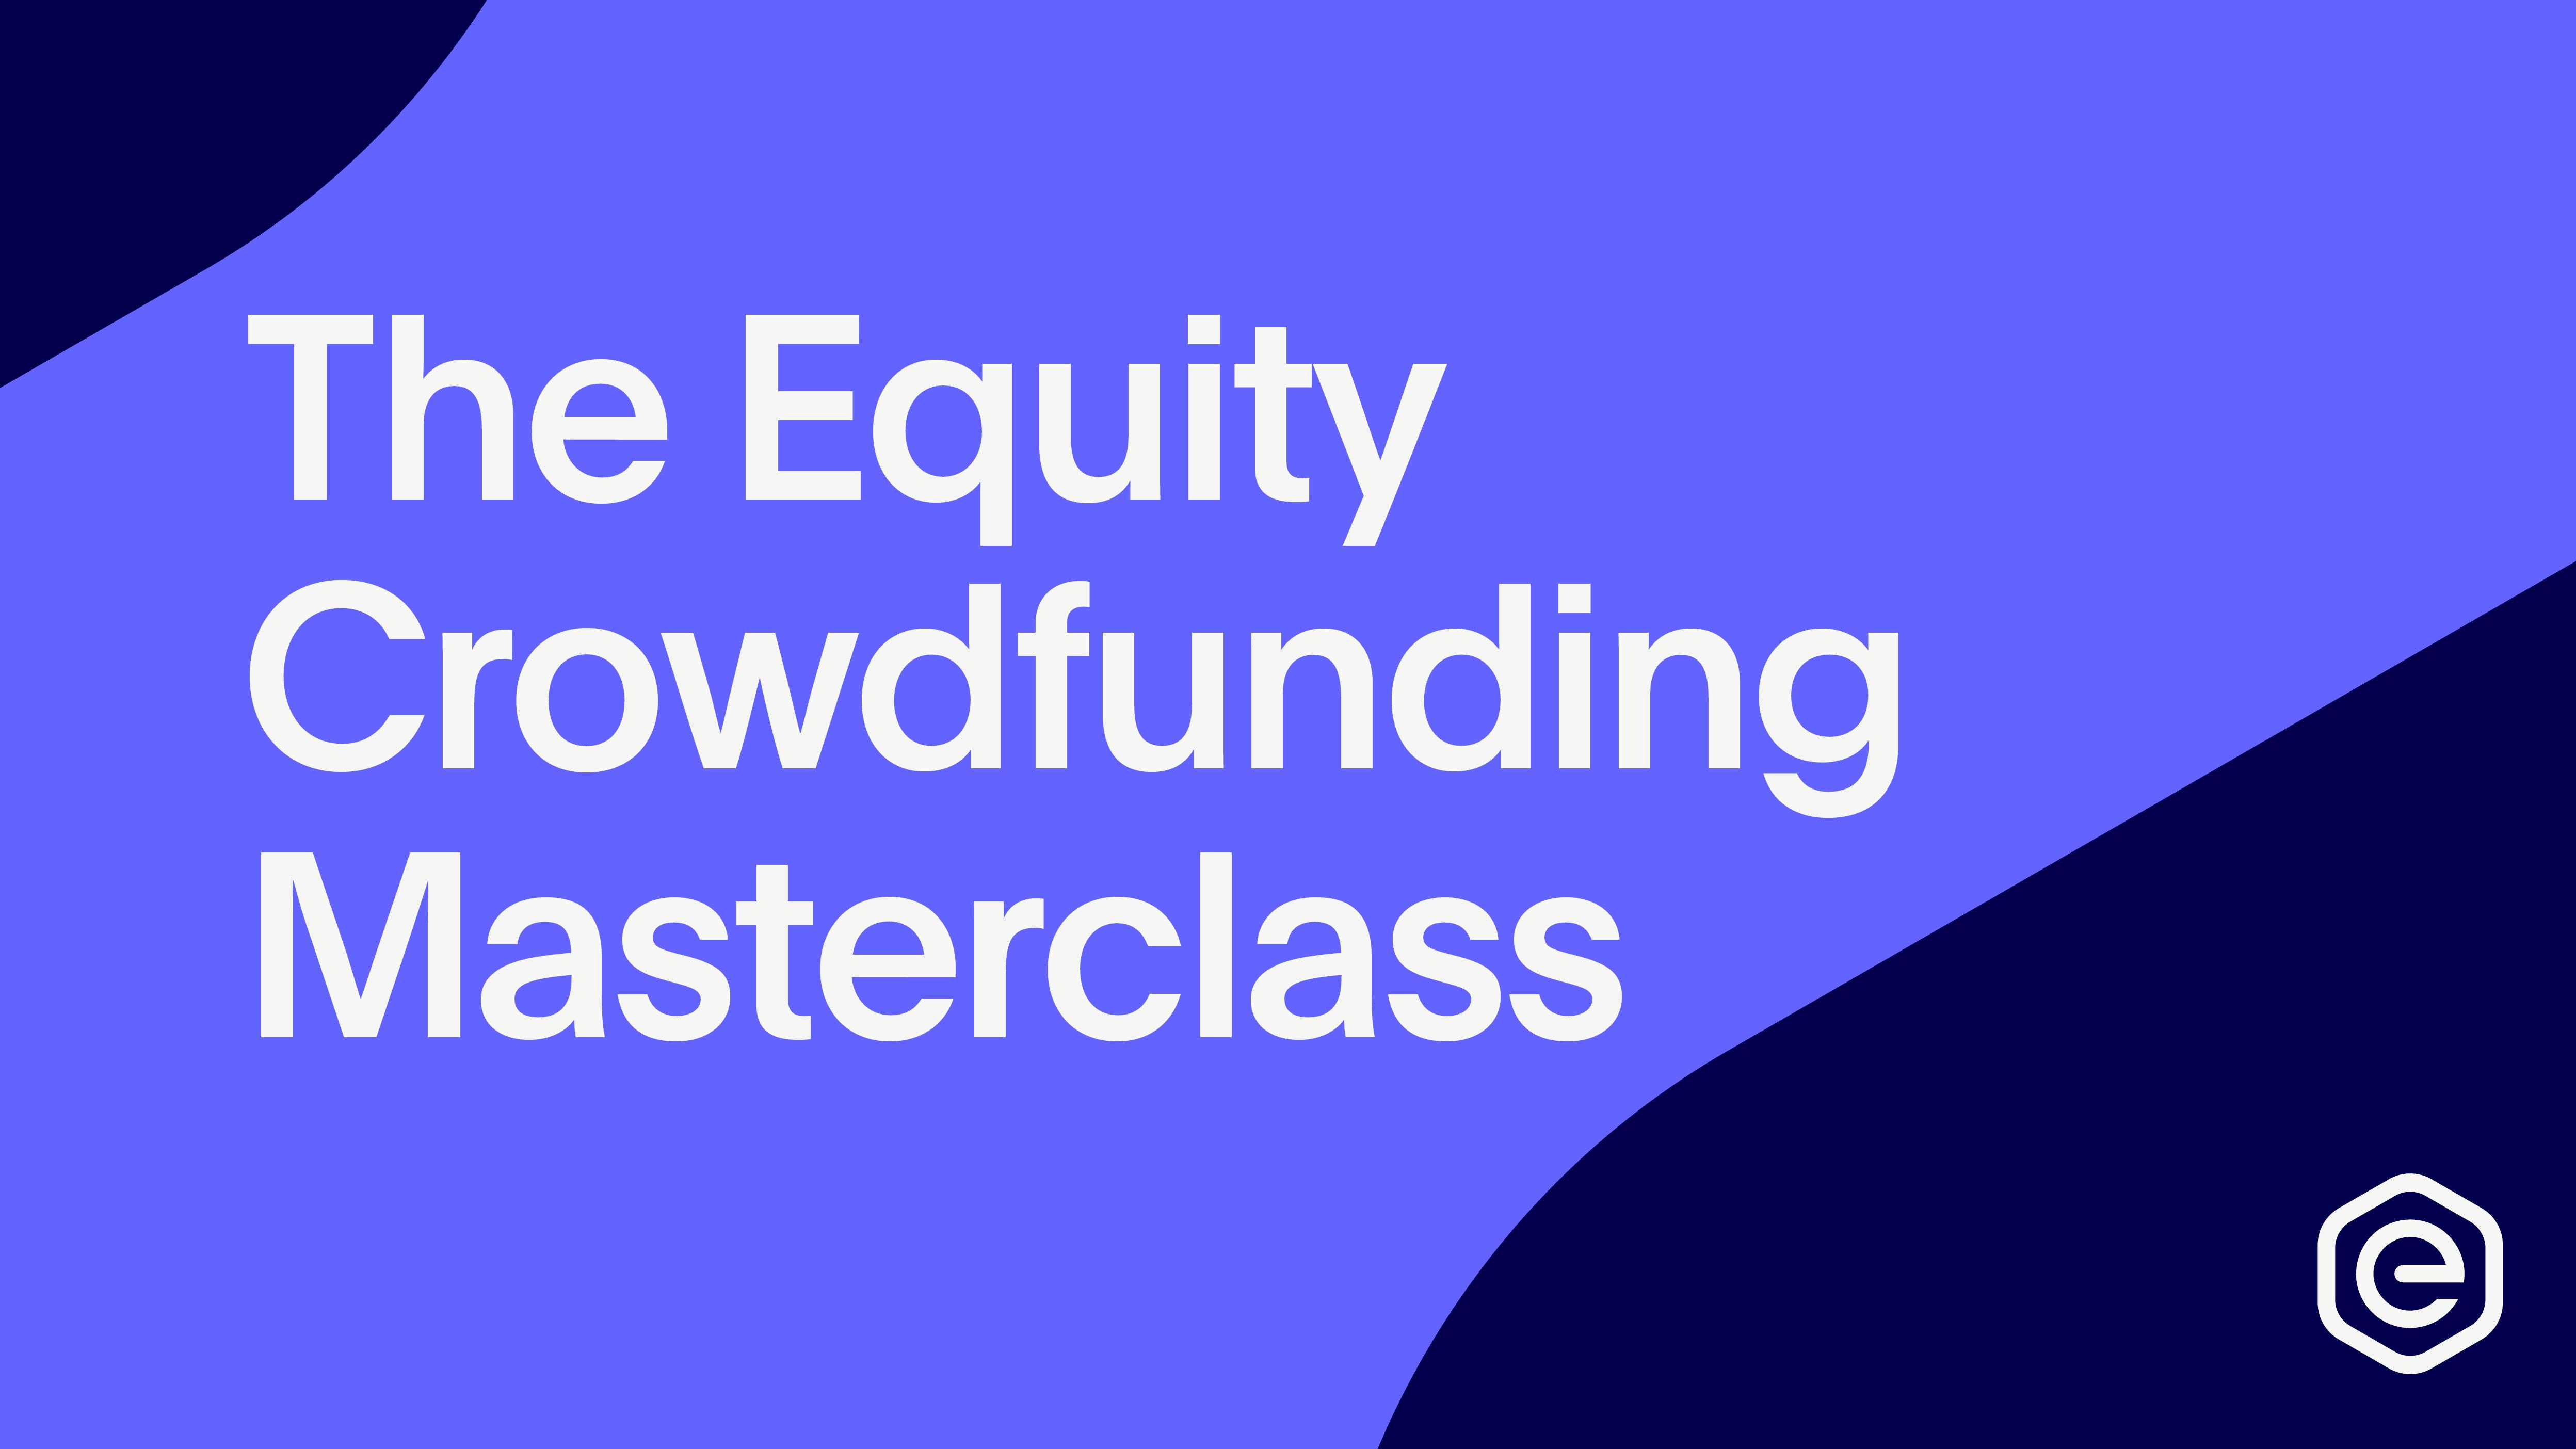 The Equity Crowdfunding Masterclass